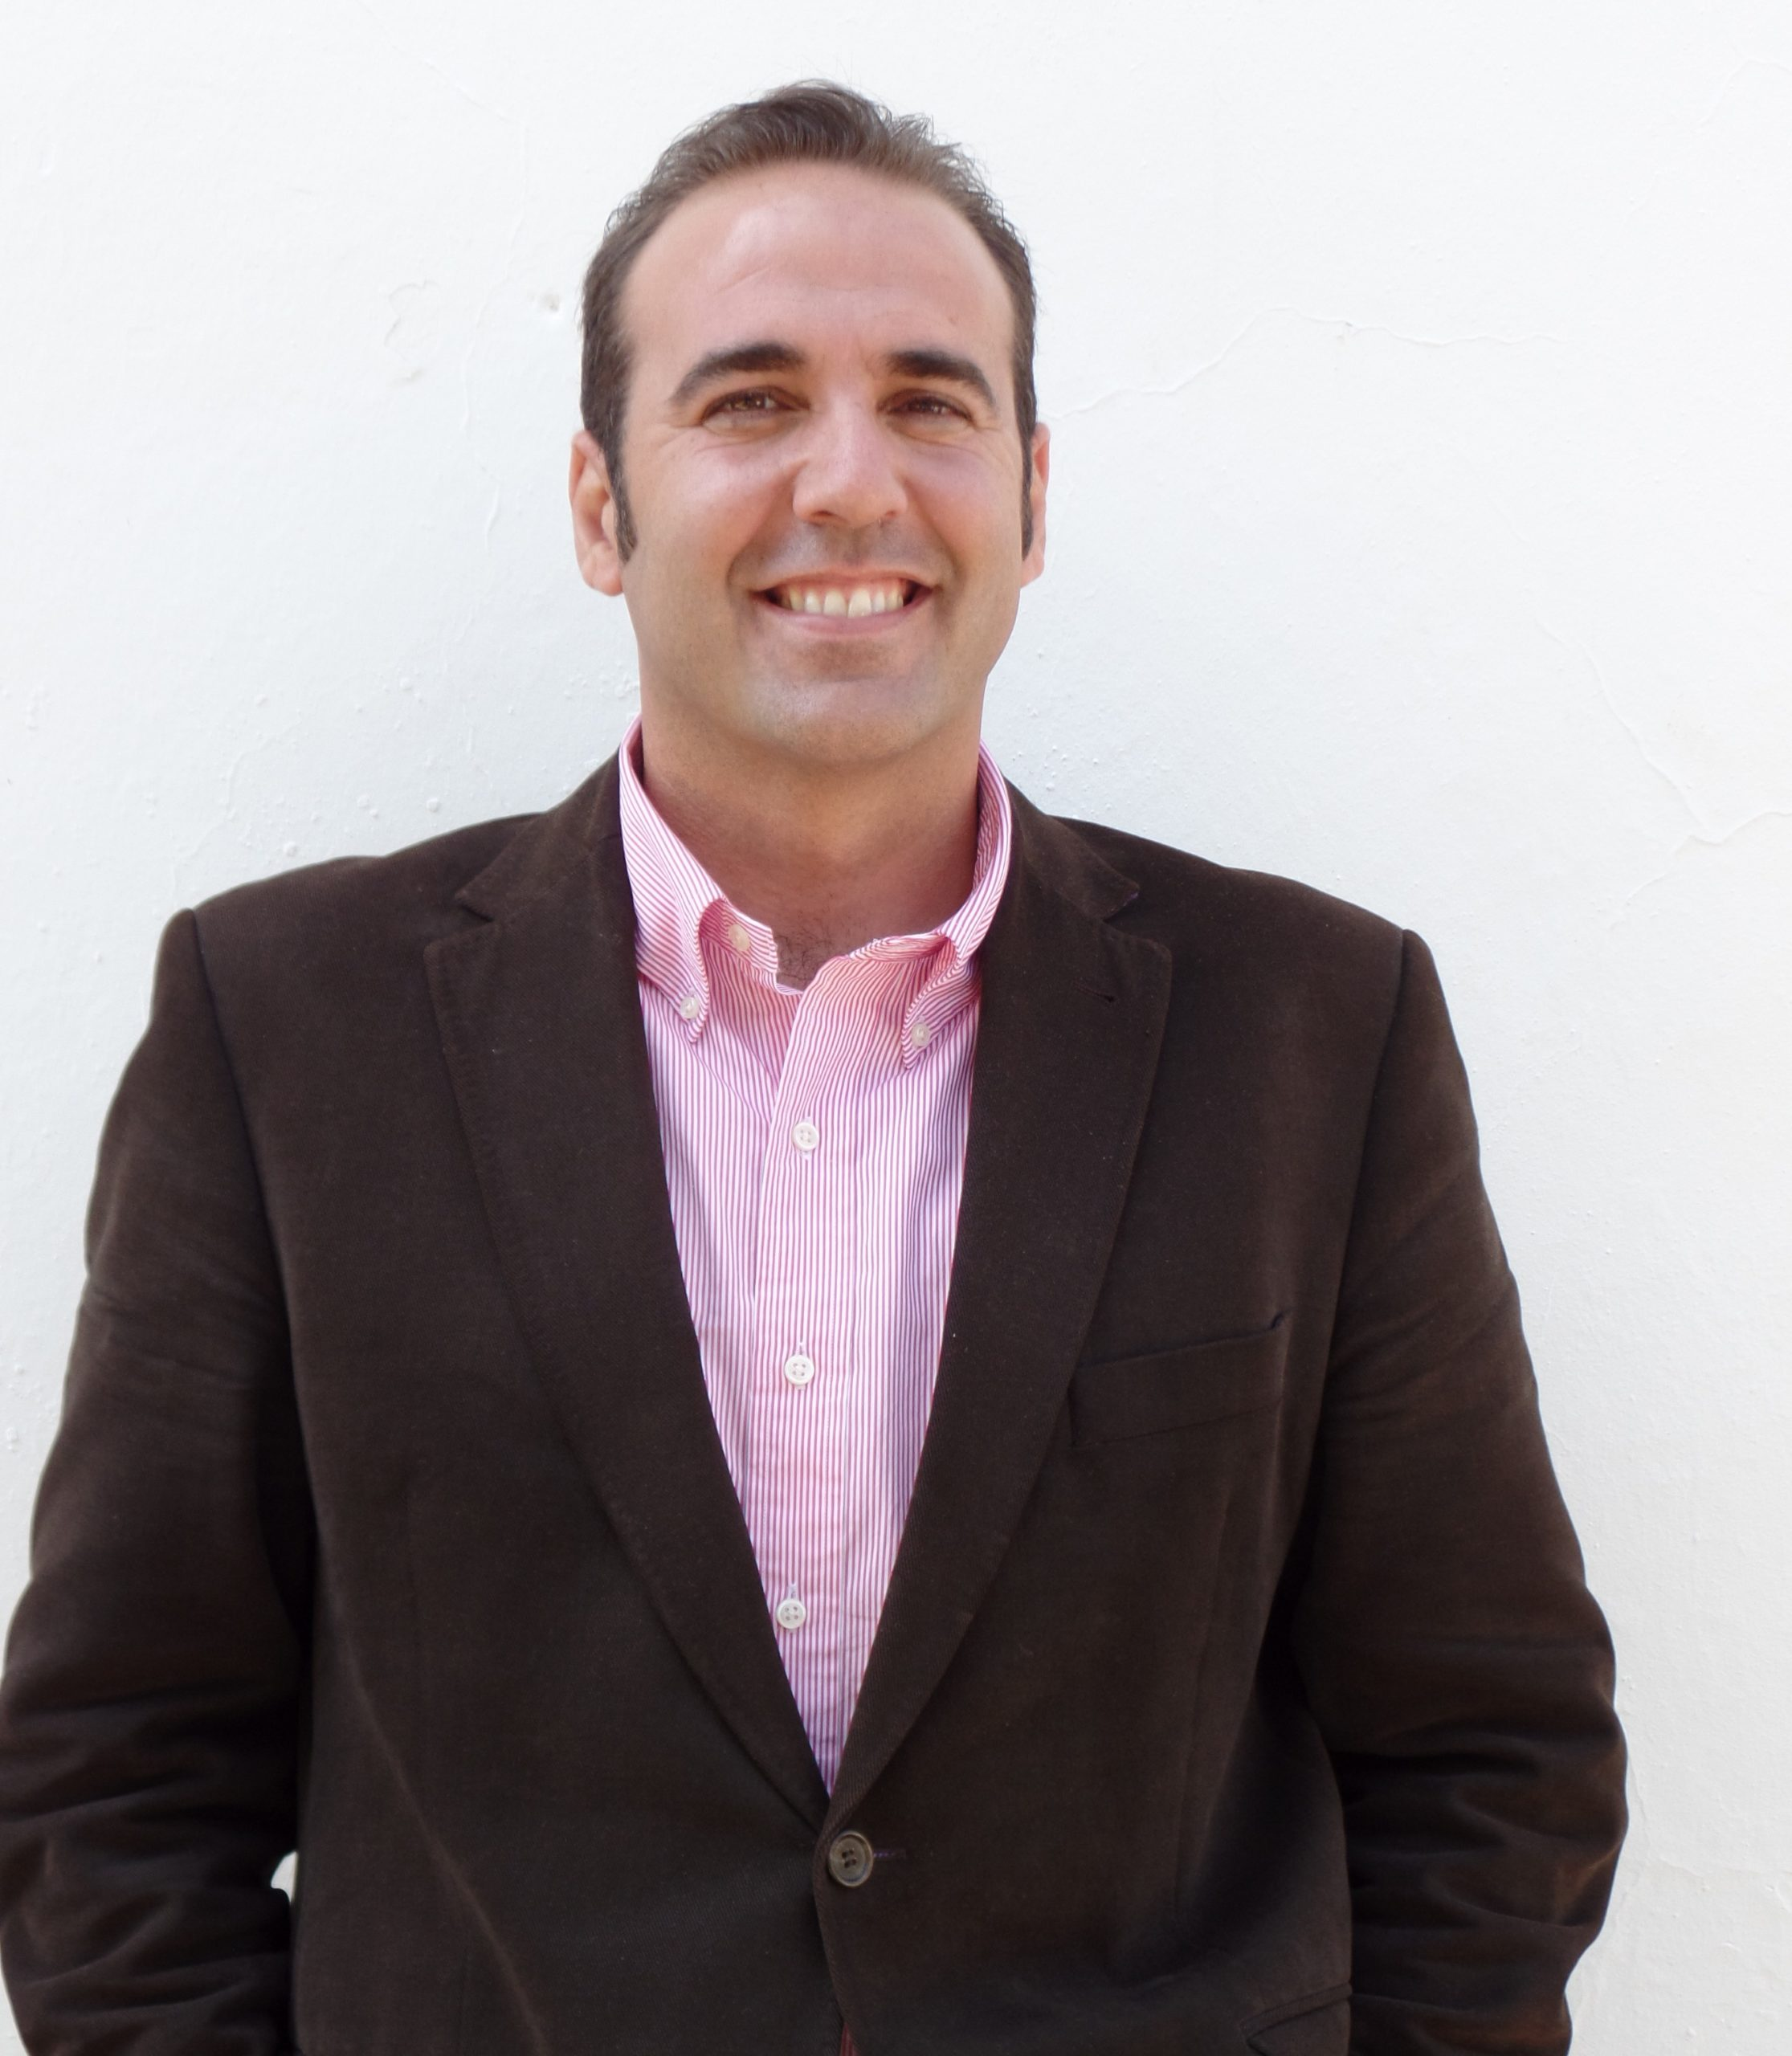 D. Francisco Javier Puertas Gracia